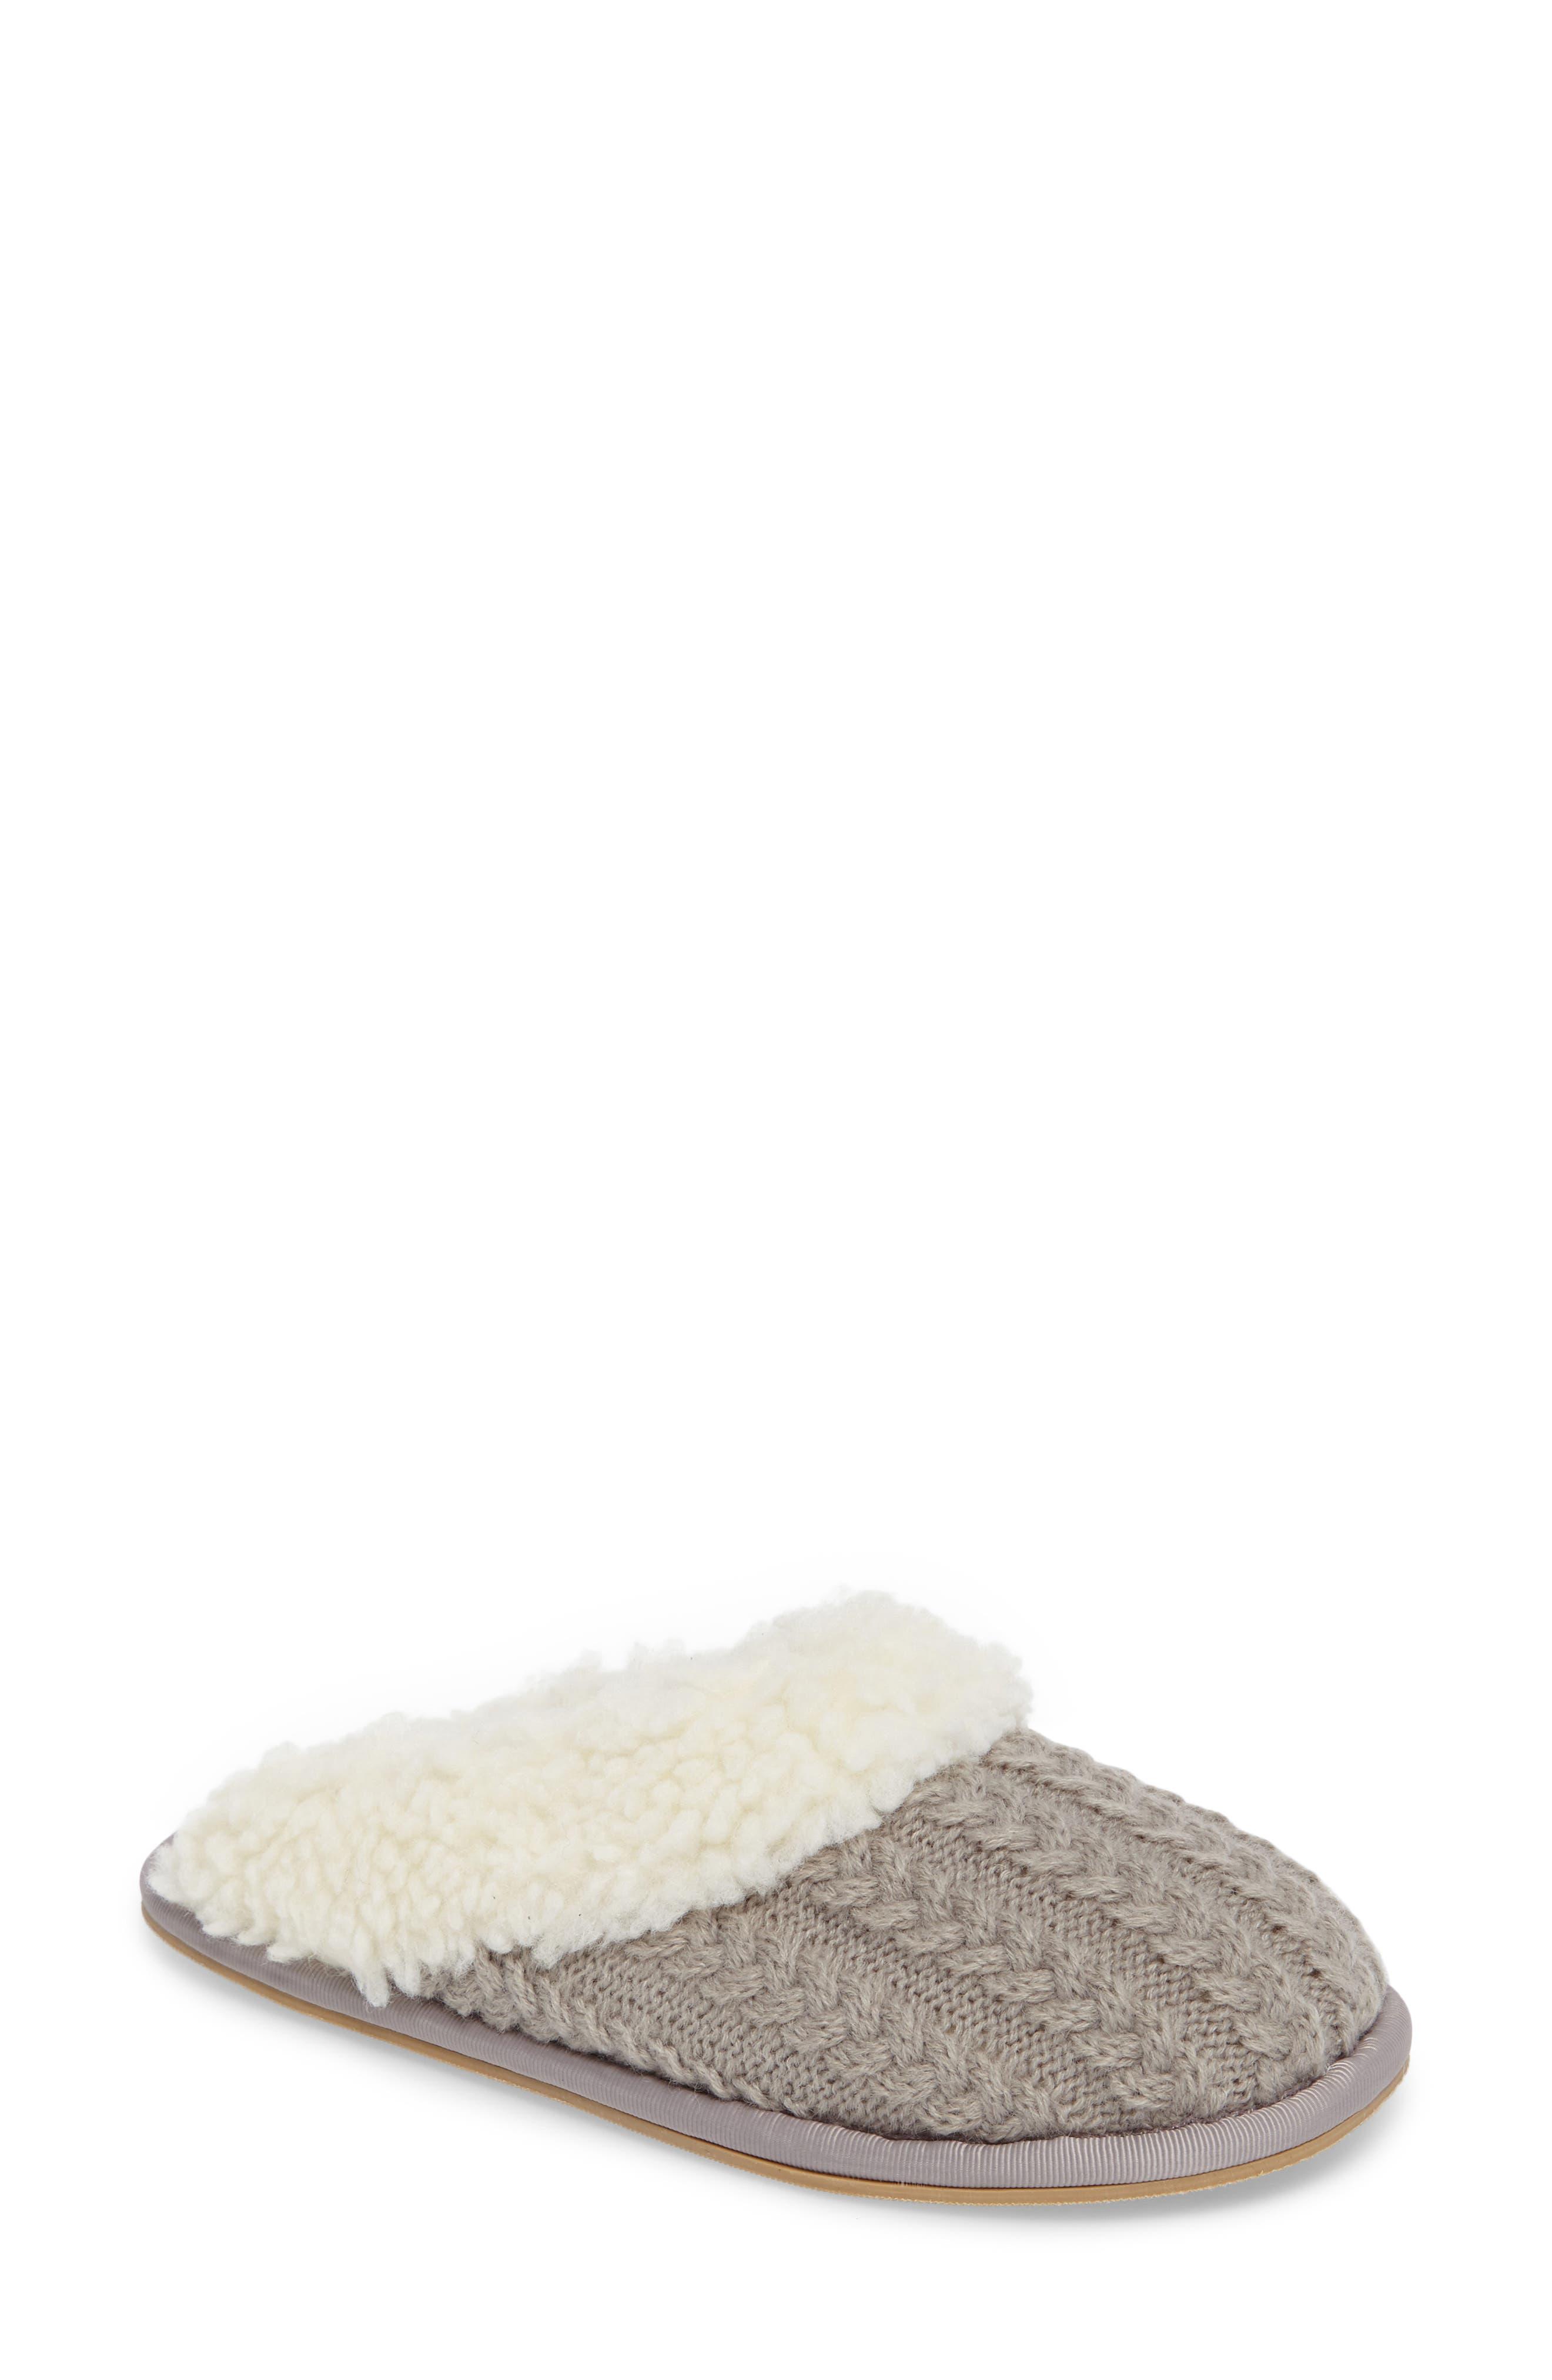 Celia Cable Knit Slipper,                             Main thumbnail 1, color,                             Grey Fabric